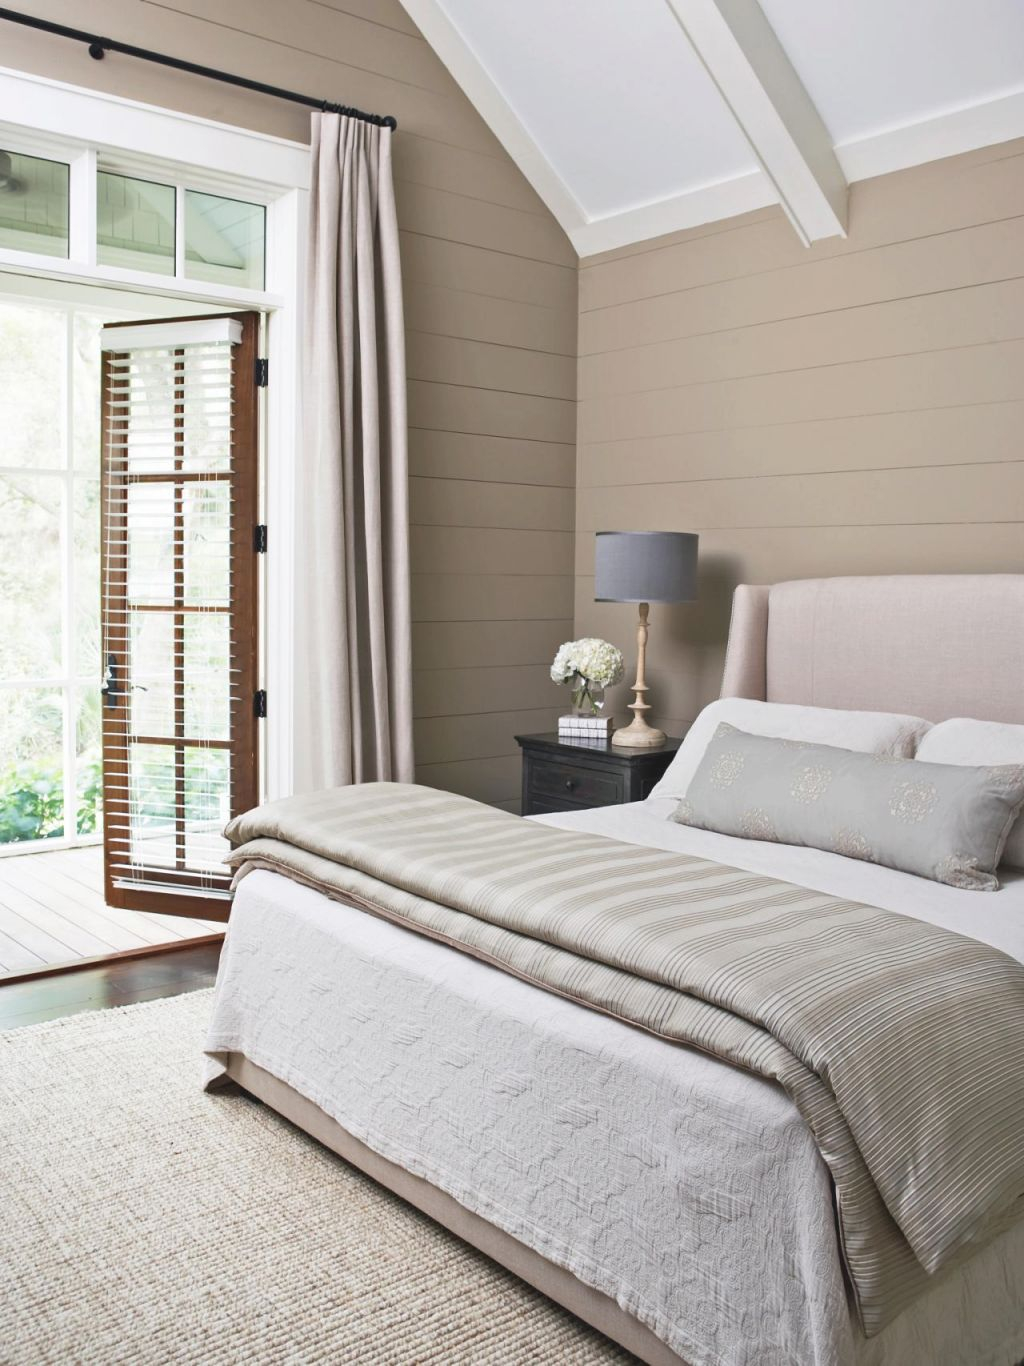 14 Ideas For Small Bedroom Decor | Hgtv's Decorating pertaining to Small Bedroom Decorating Ideas